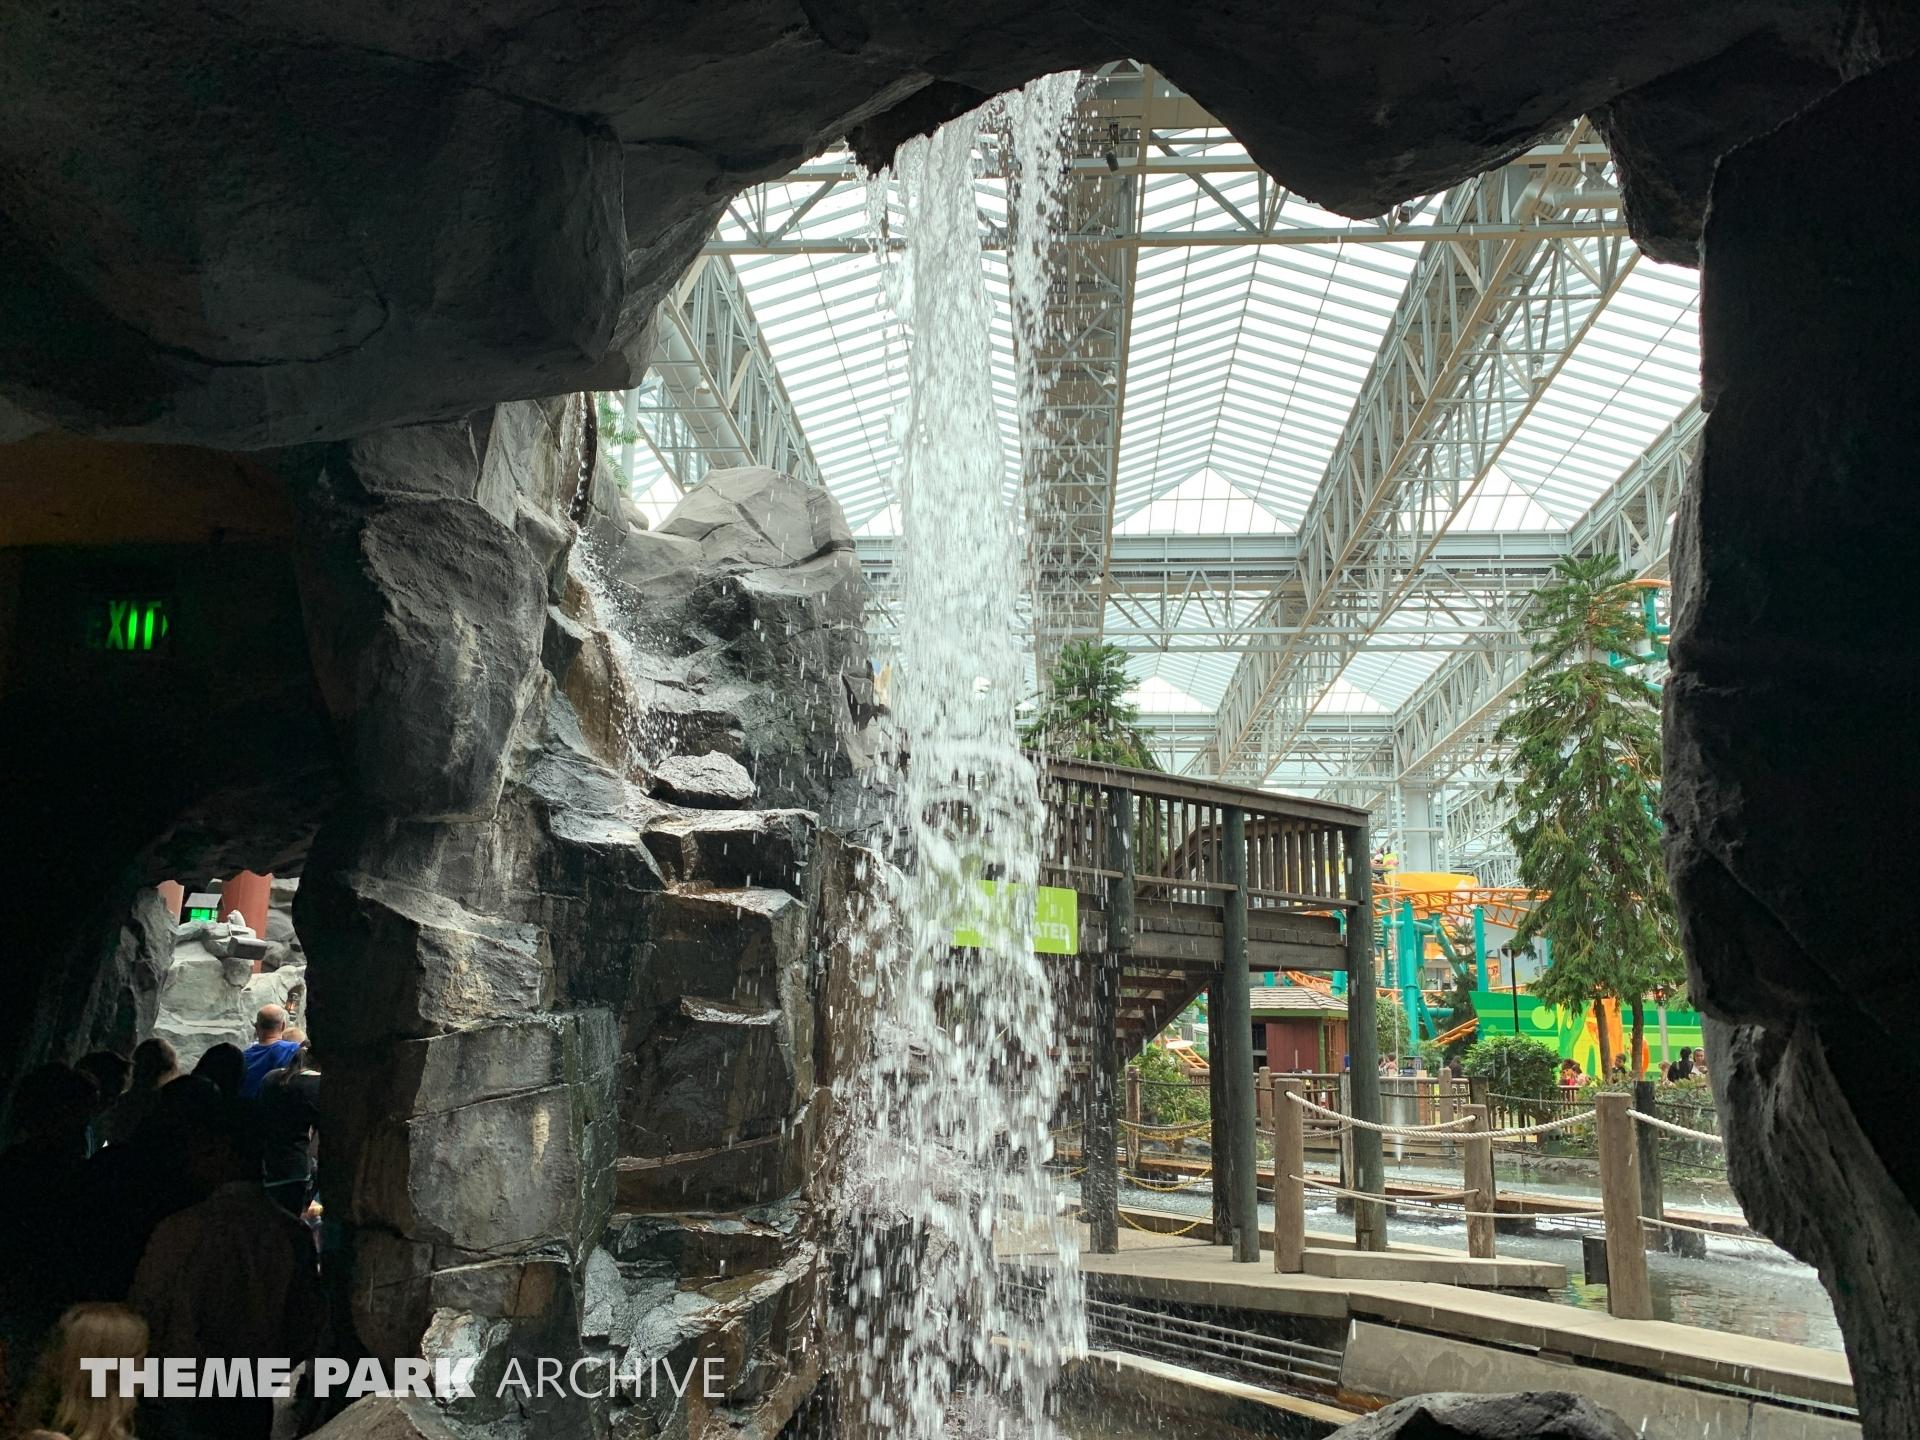 Paul Bunyan's Log Chute at Nickelodeon Universe at Mall of America